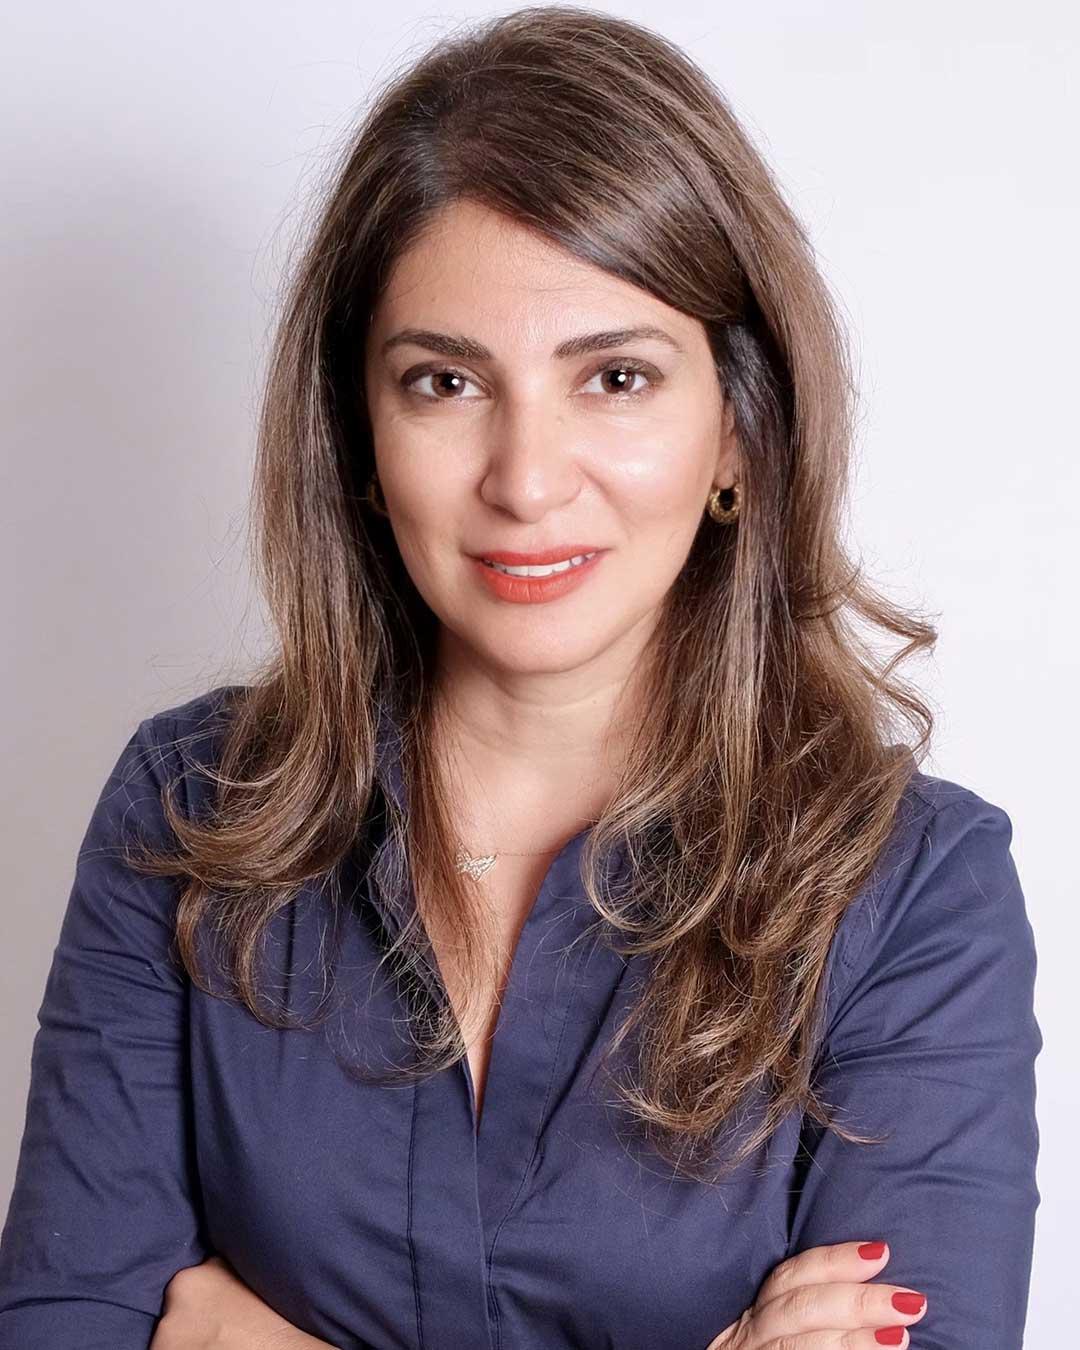 Endodontist Dr. Yaz Al-Zoubaidy